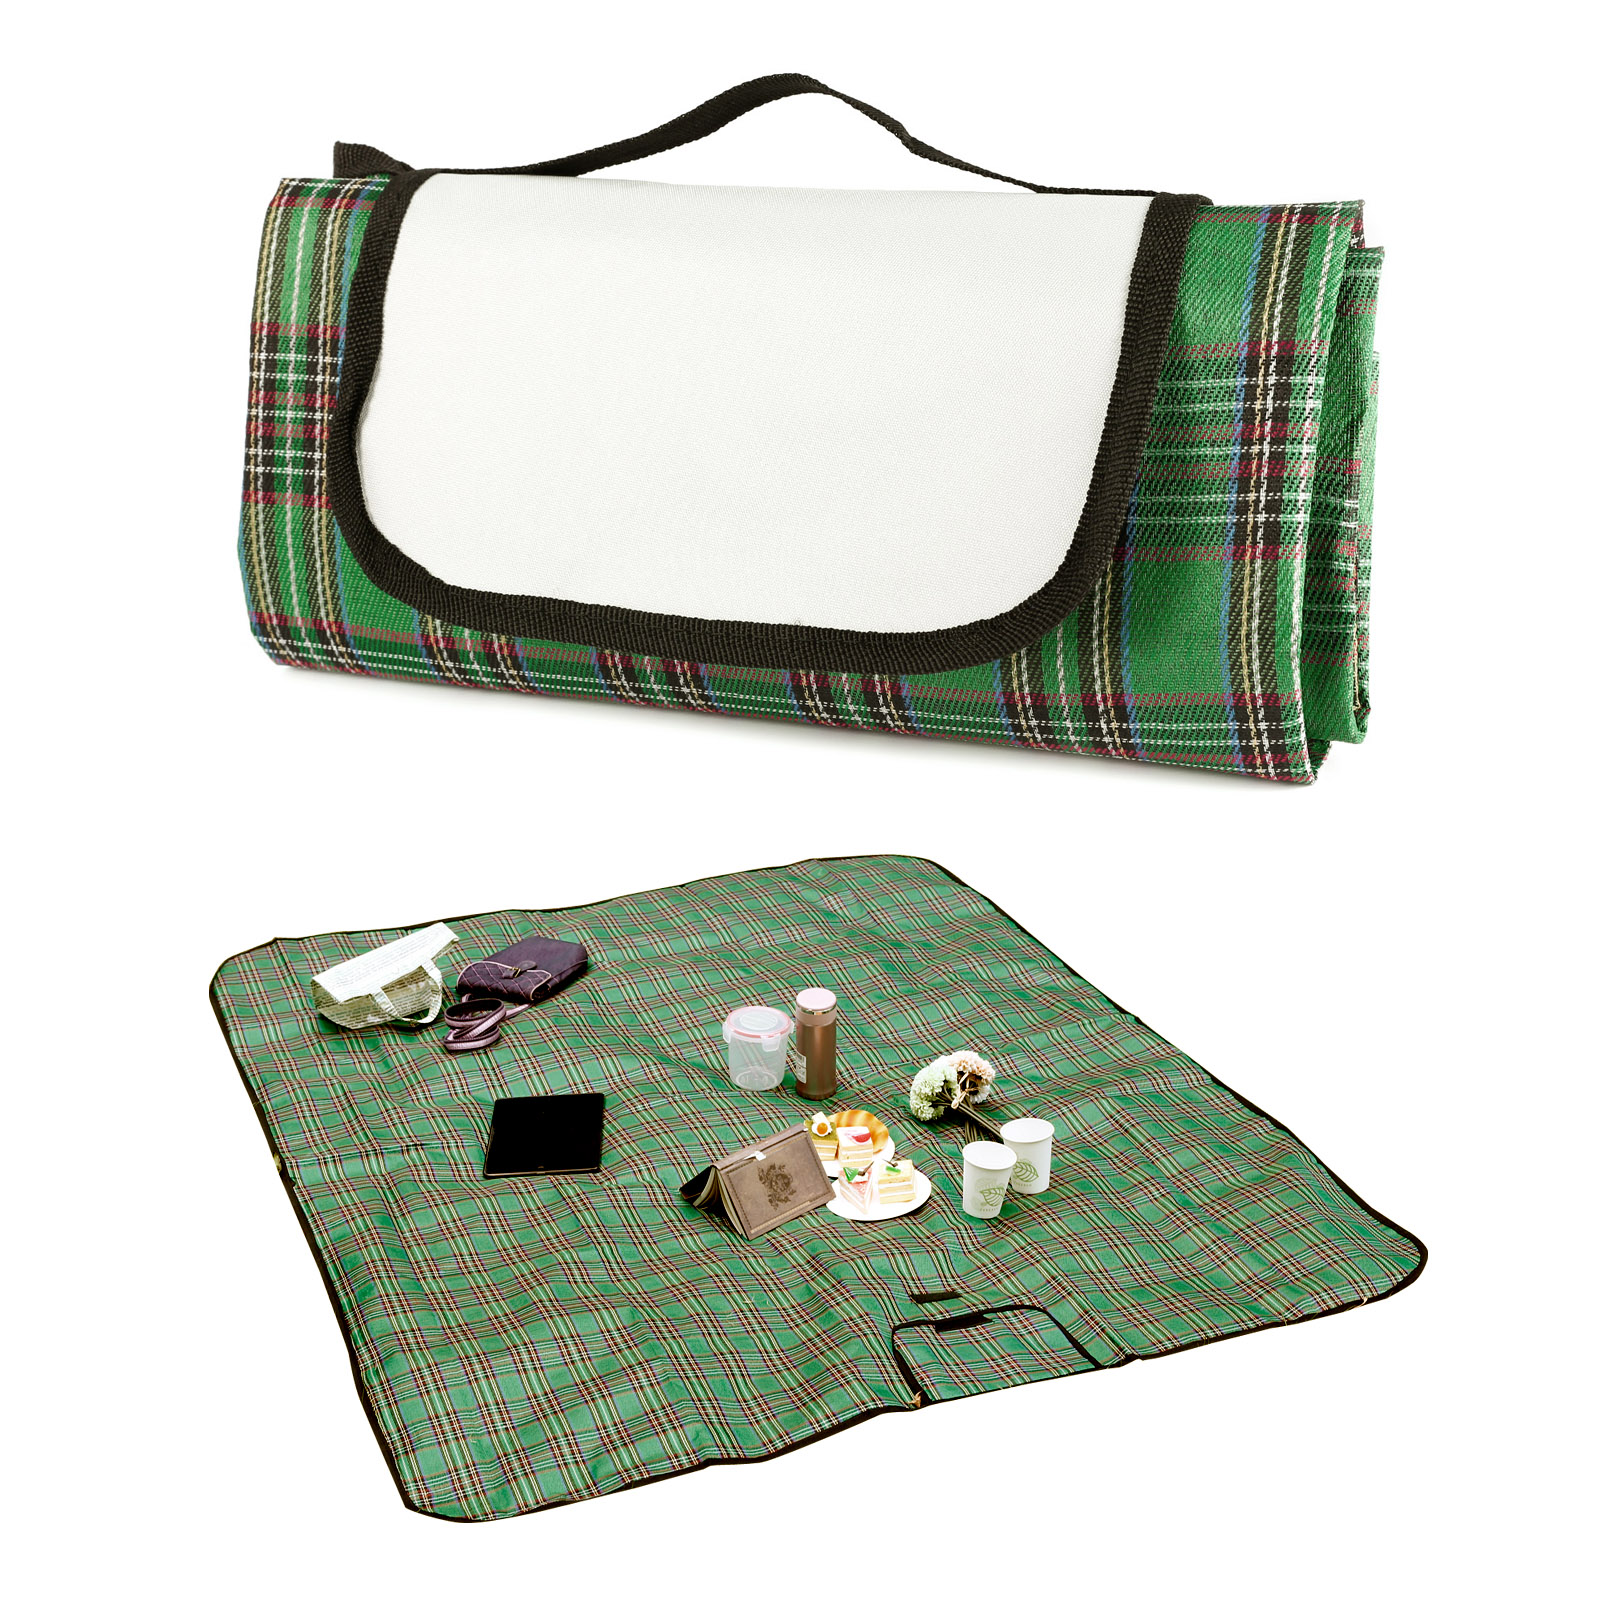 Picnic Blanket: Extra Large Waterproof Picnic Mat Blanket Rug Travel